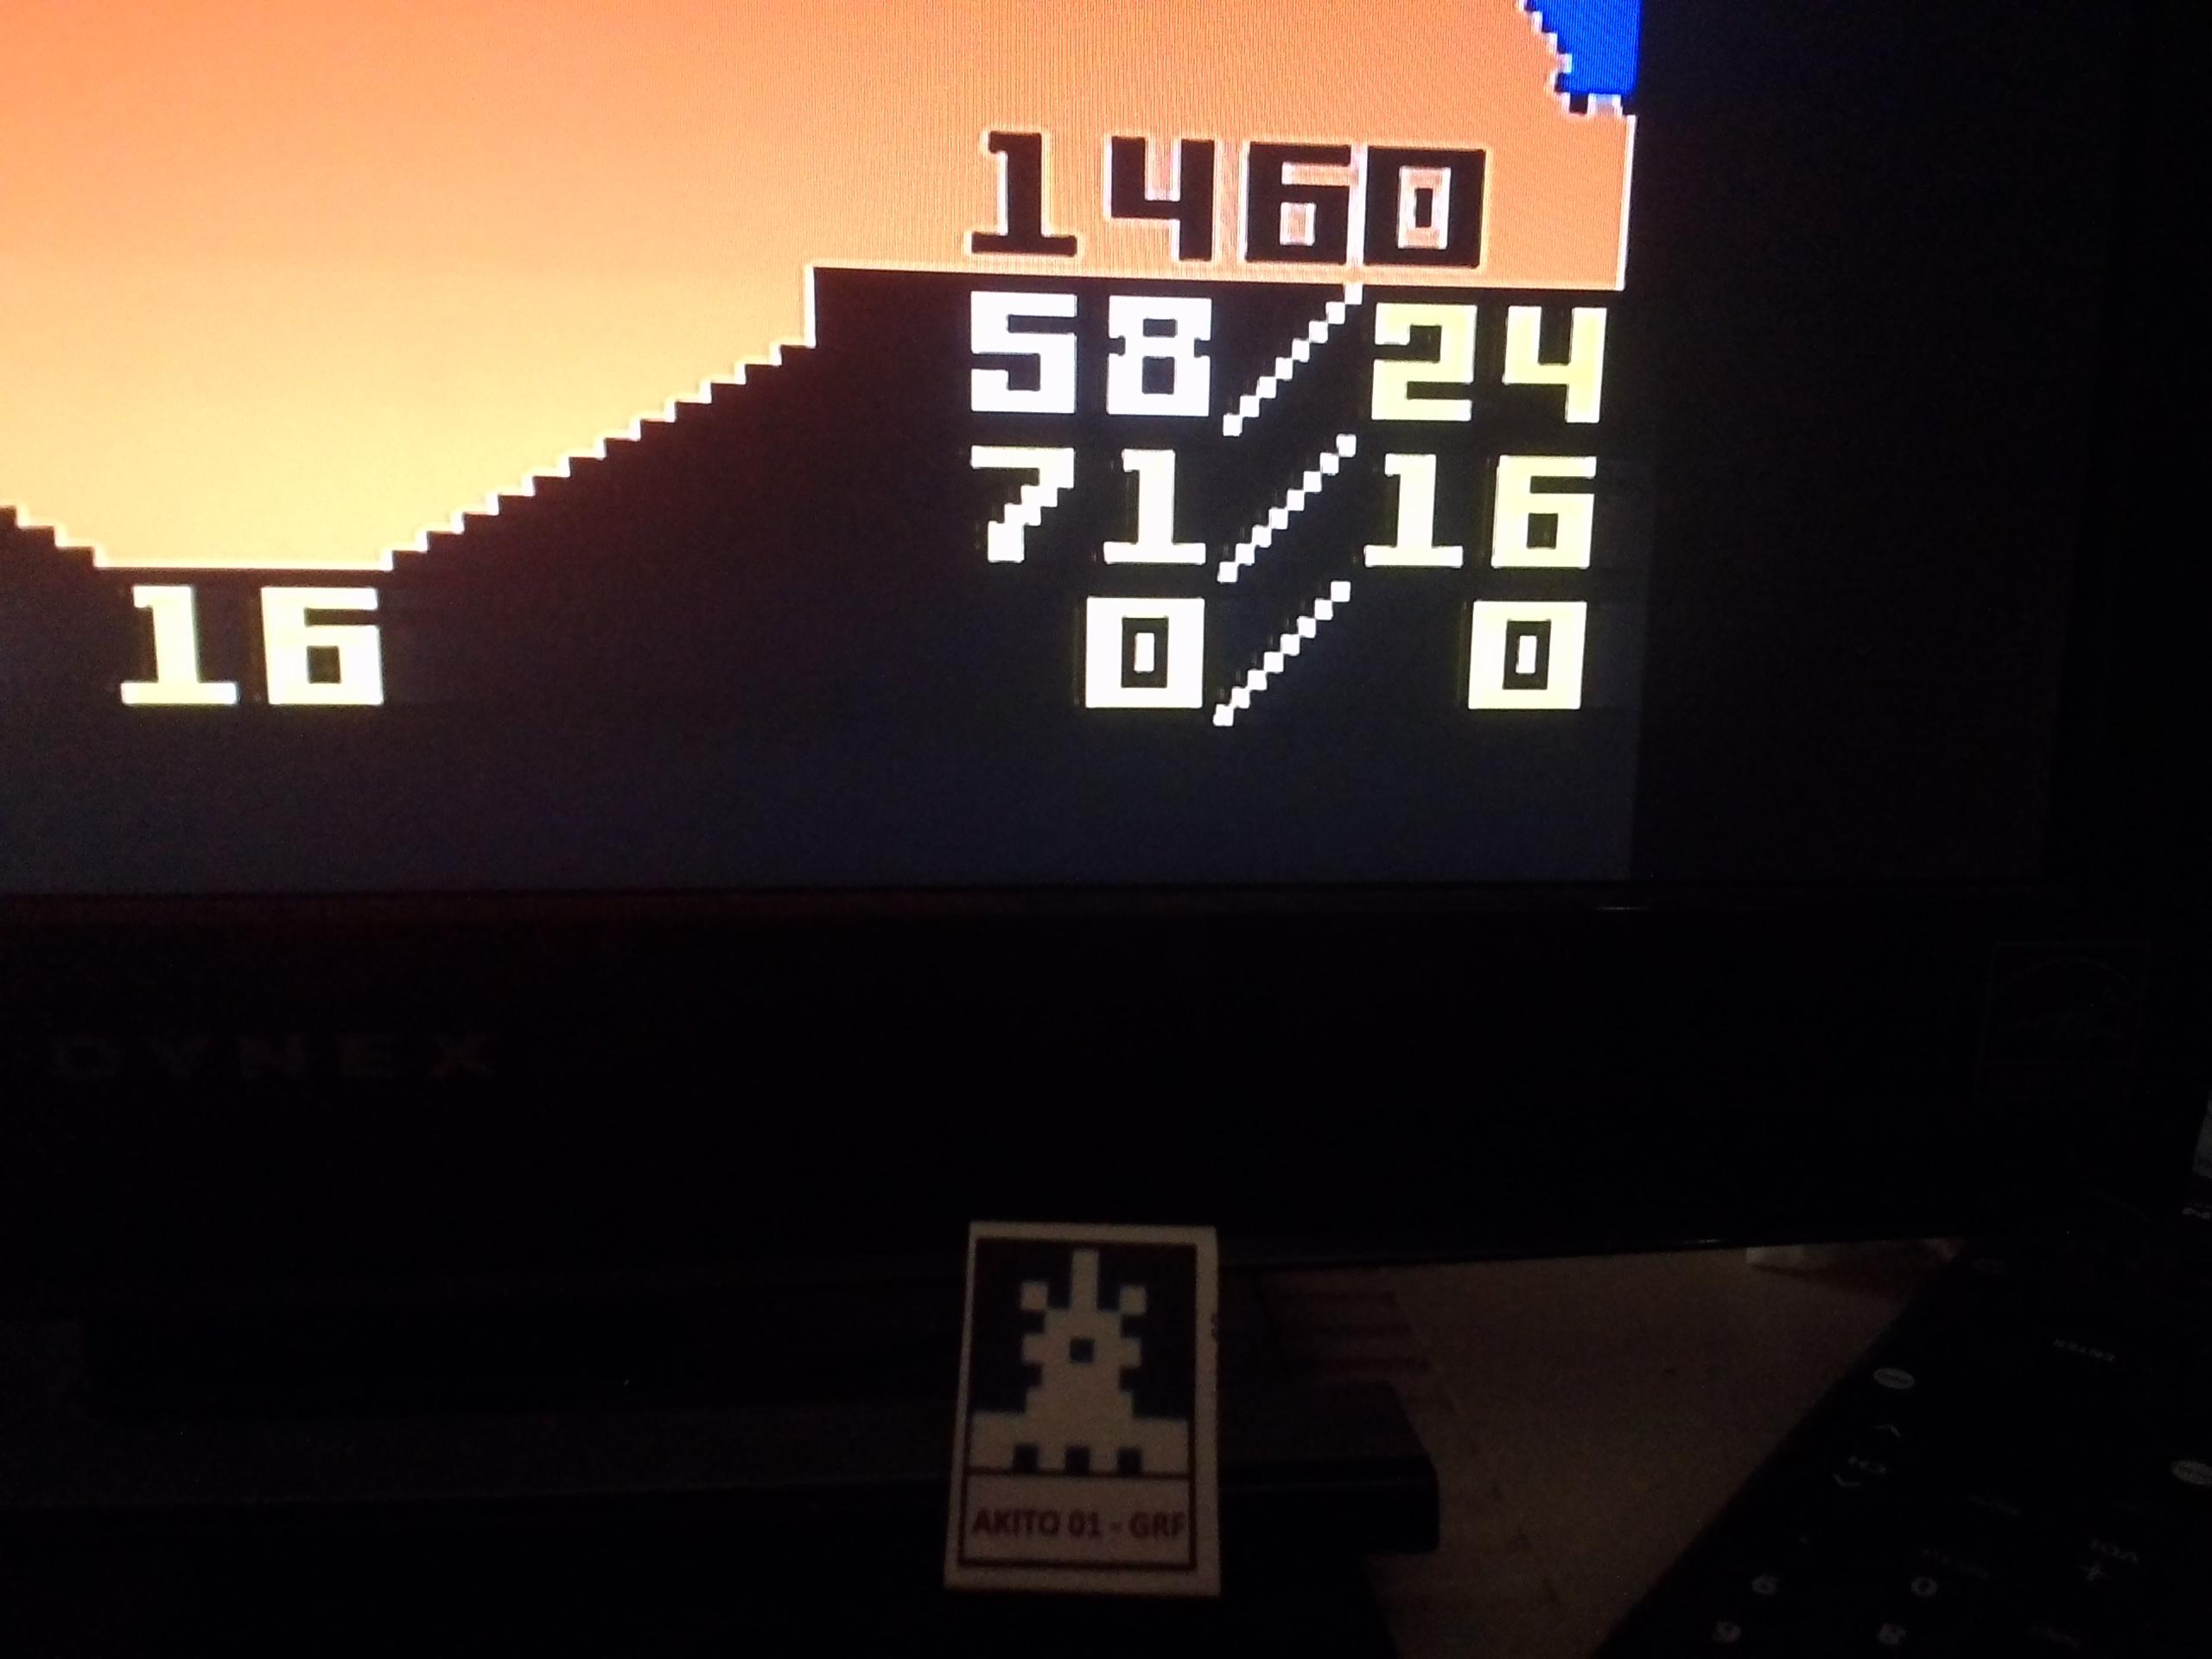 Akito01: Minotaur: Game 3 [Easiest] (Intellivision Flashback) 1,460 points on 2017-06-14 20:58:27